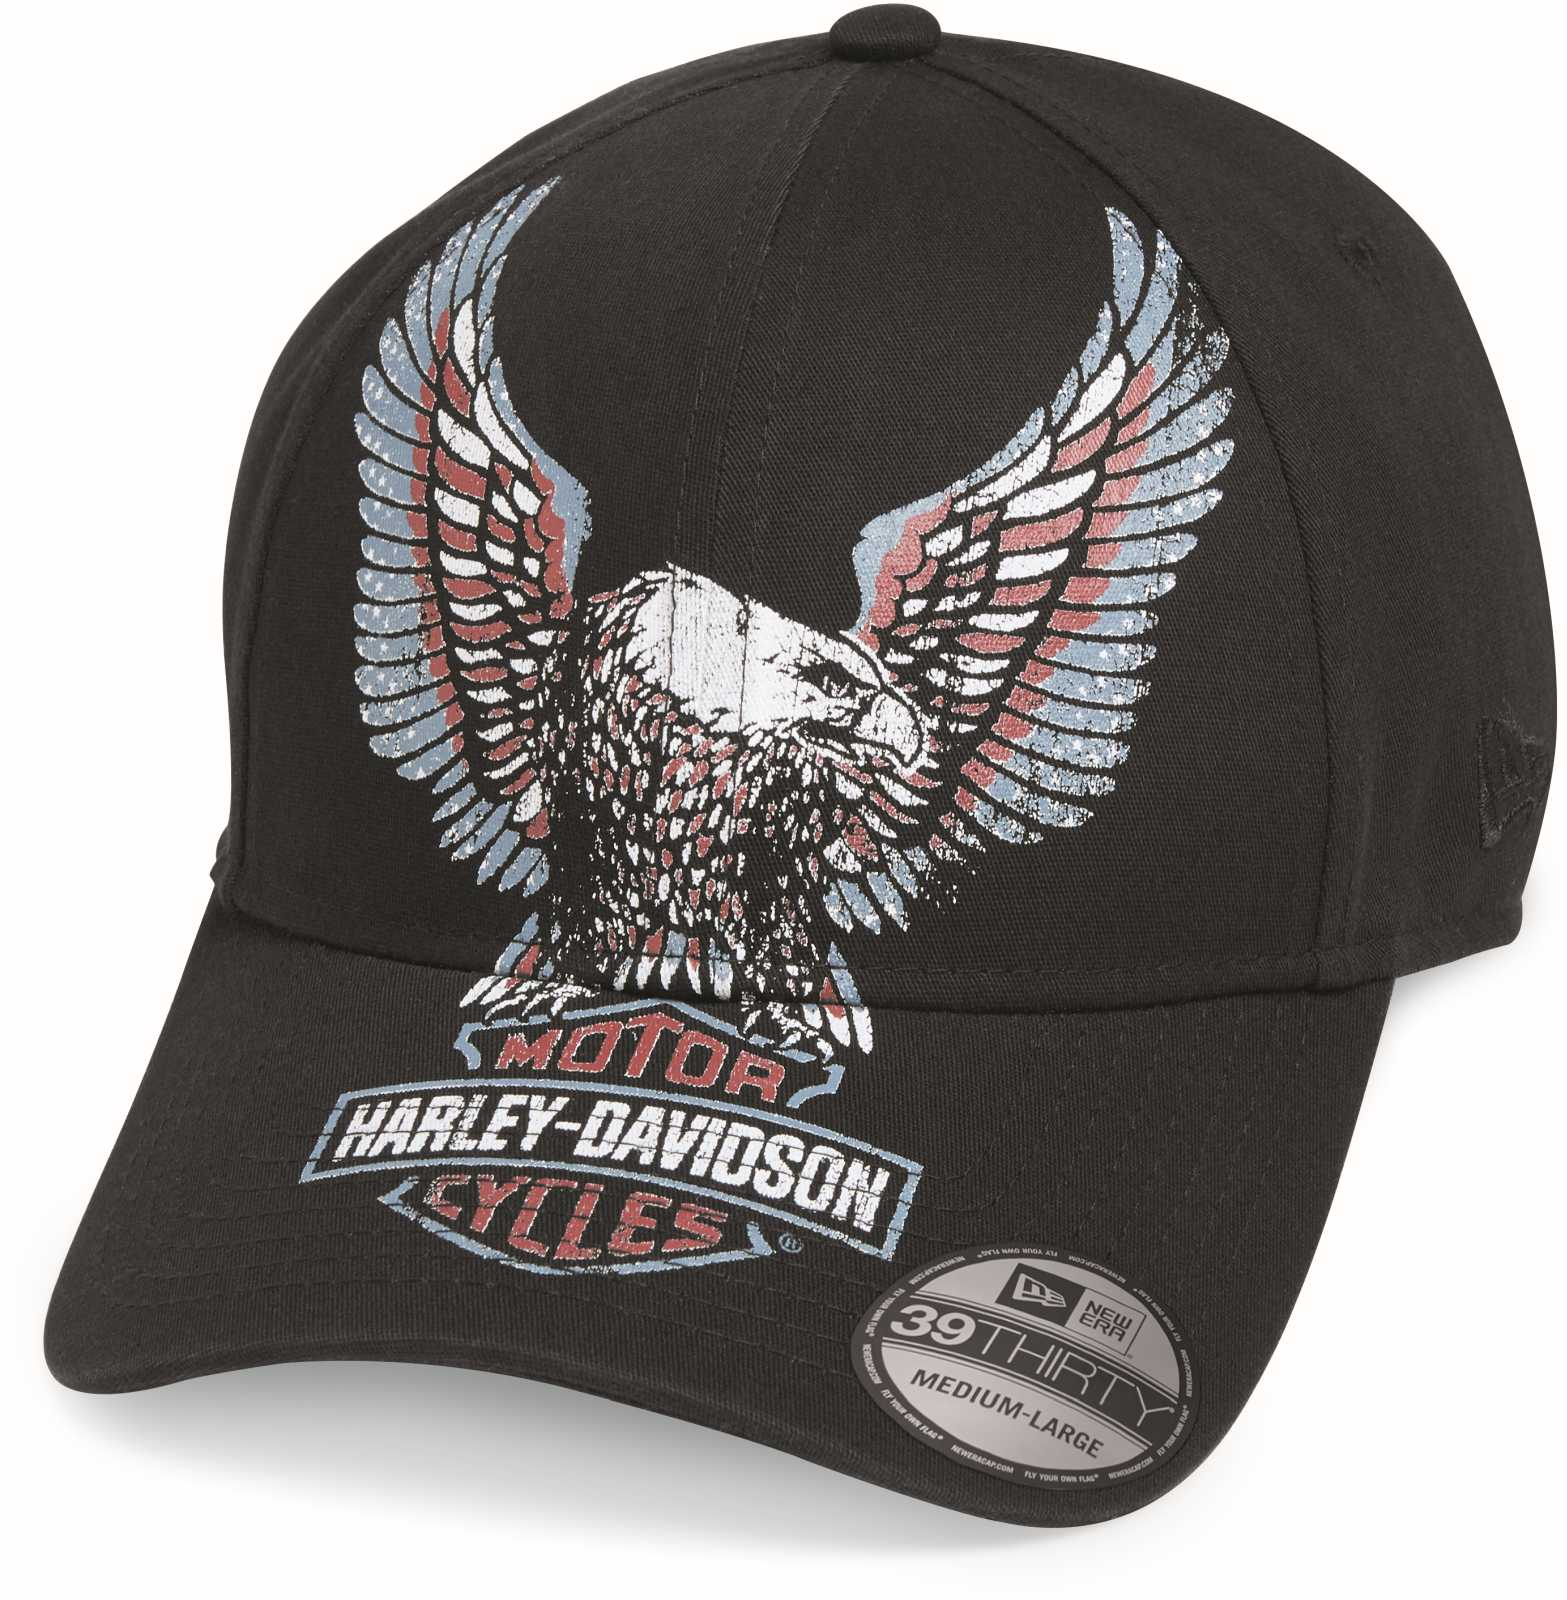 a9d72e518ff ... H-D Motorclothes Harley-Davidson Baseball Cap Eagle Printed -  99473-19VM ...